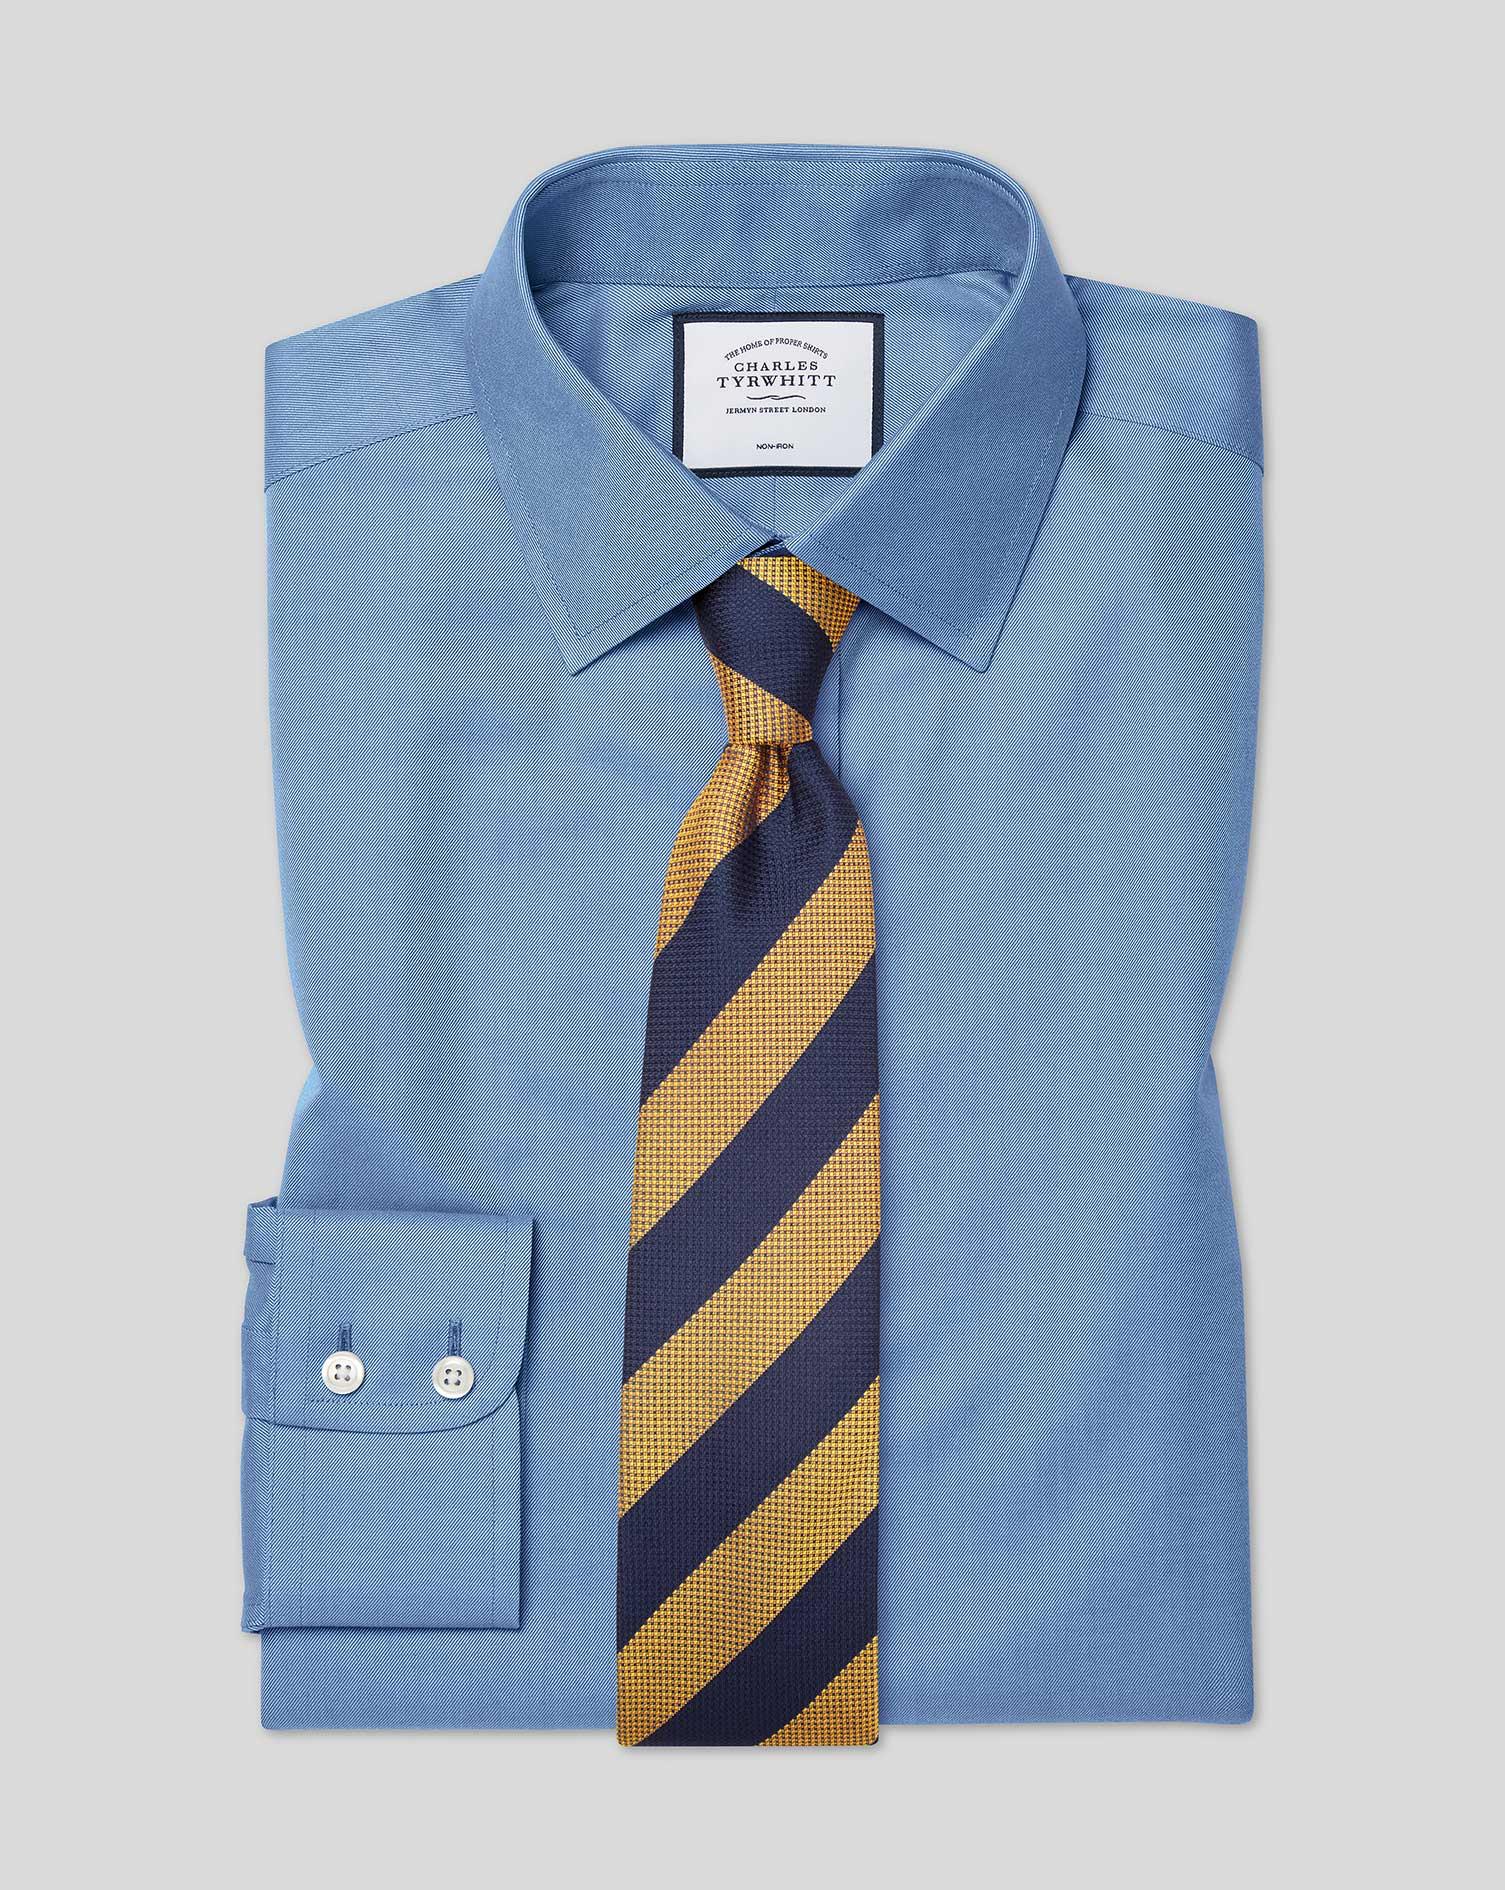 Cotton Classic Fit Non-Iron Twill Blue Shirt